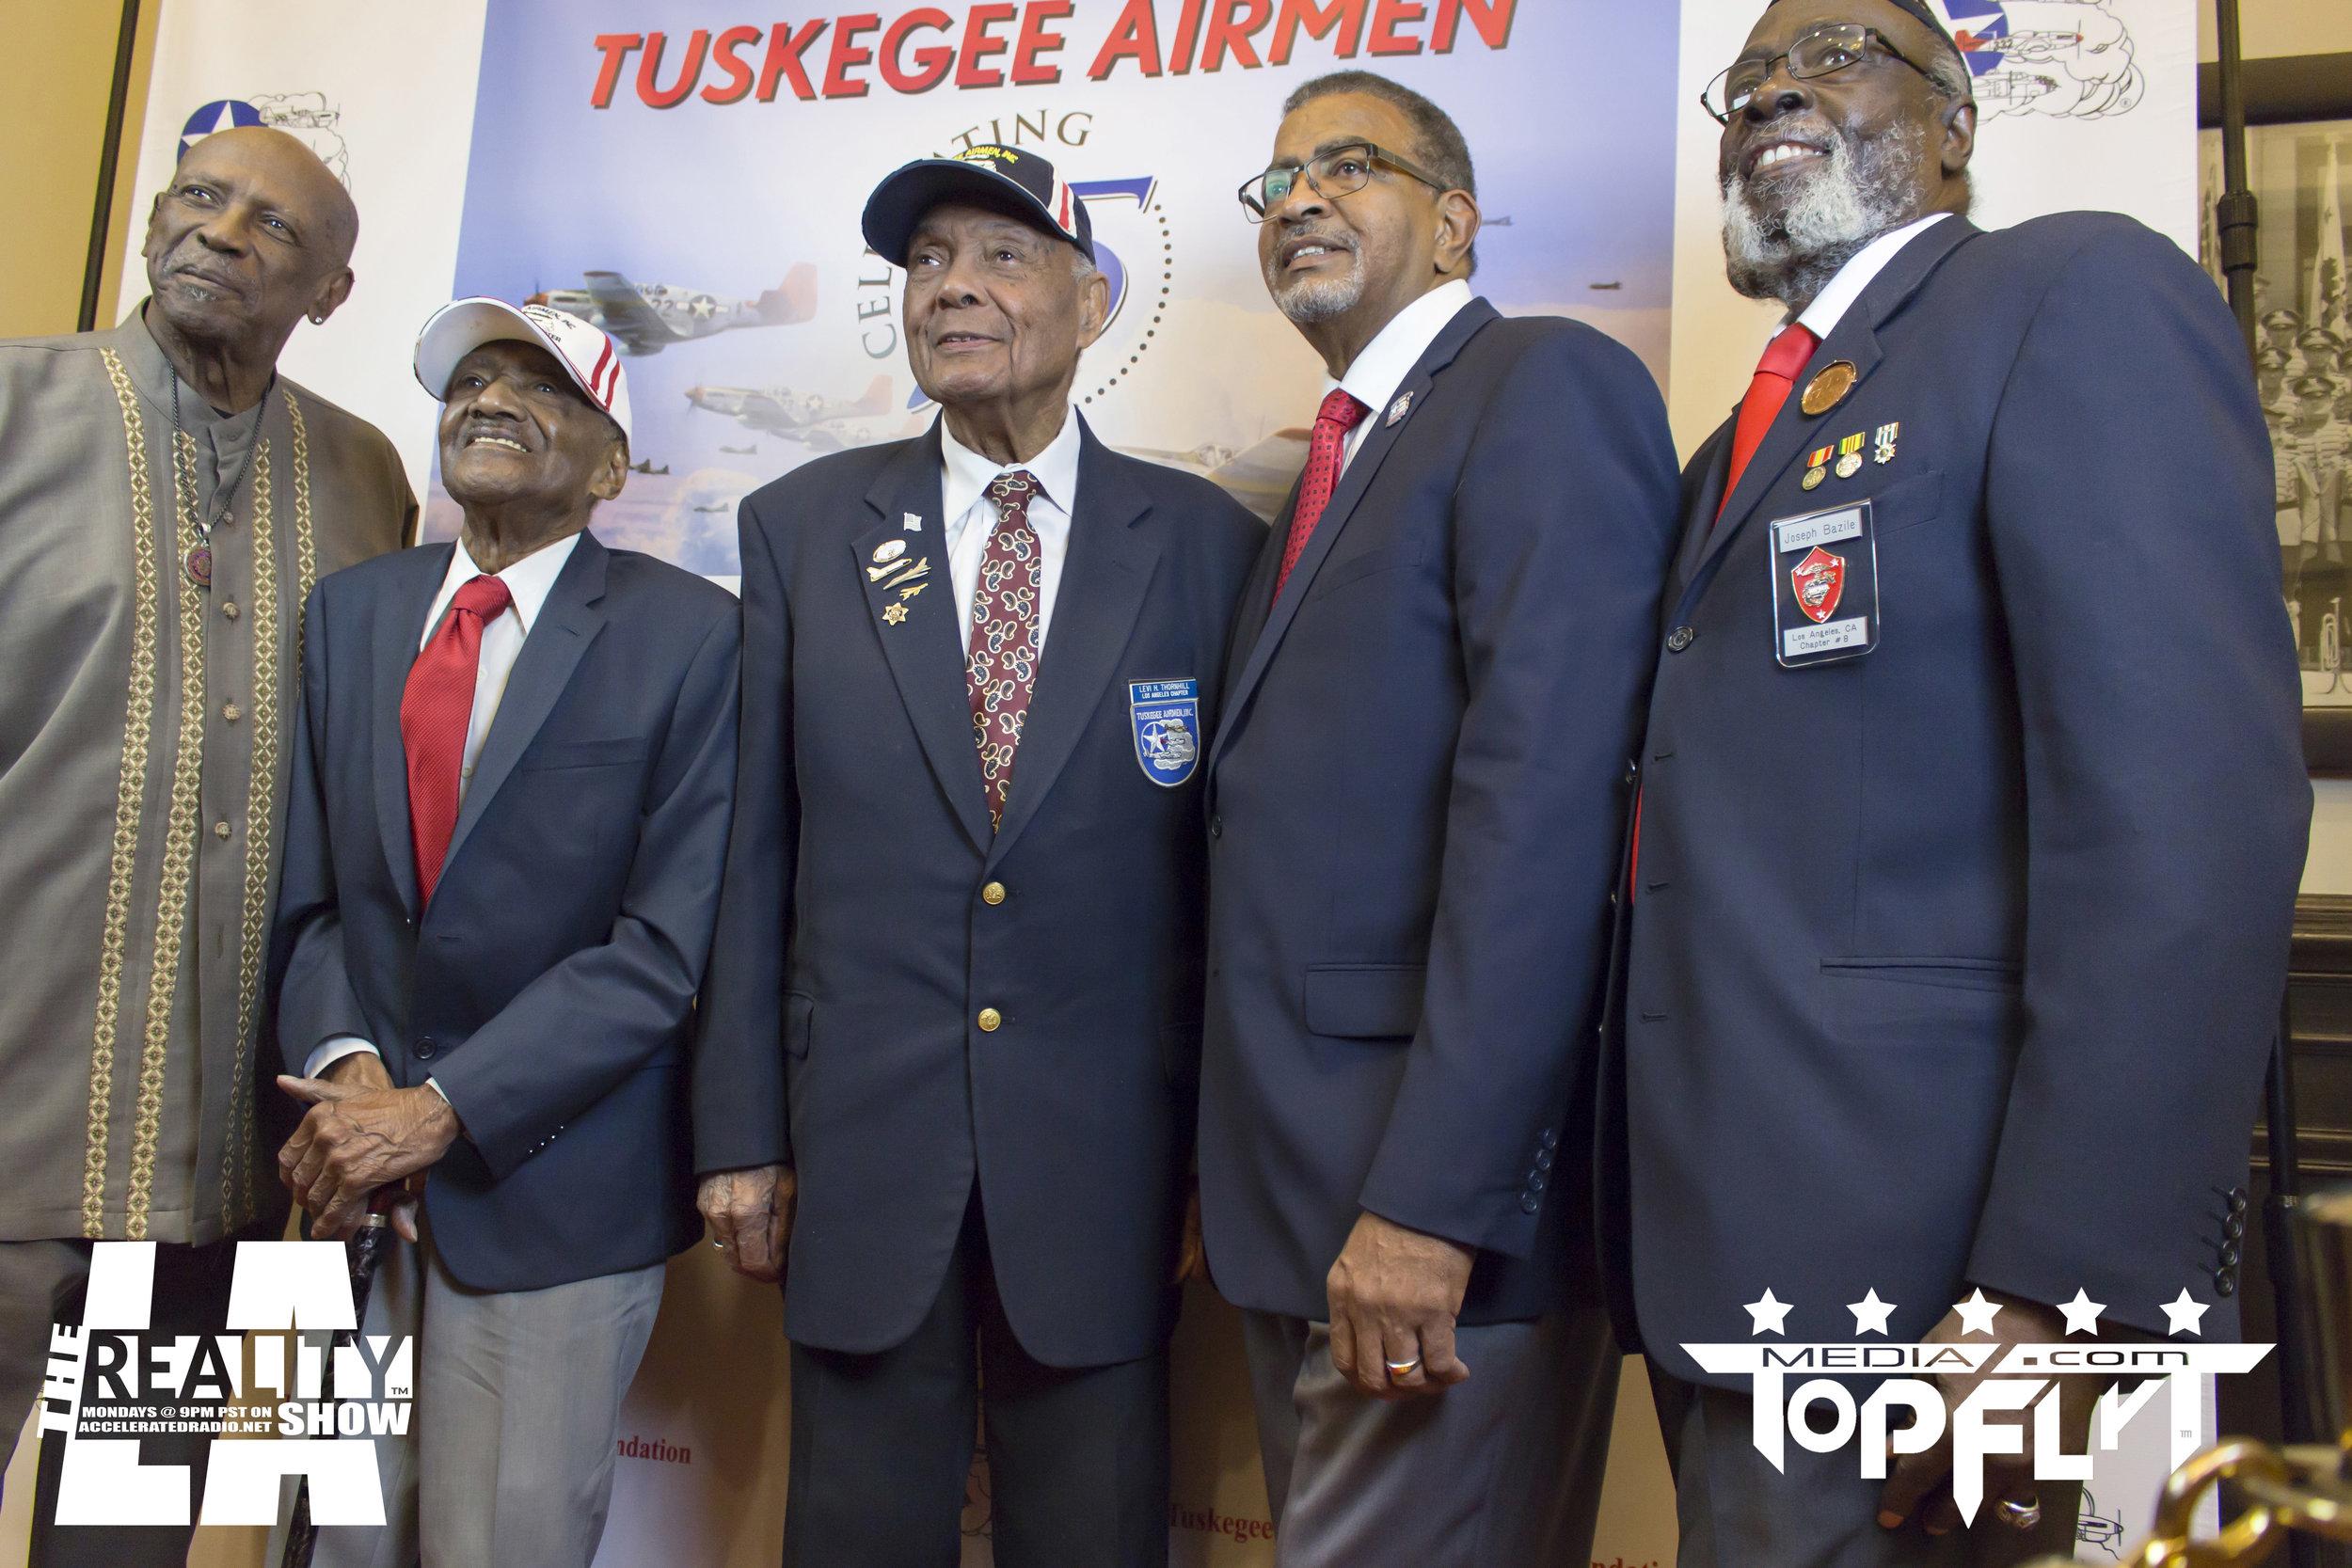 The Reality Show LA - Tuskegee Airmen 75th Anniversary VIP Reception_163.jpg